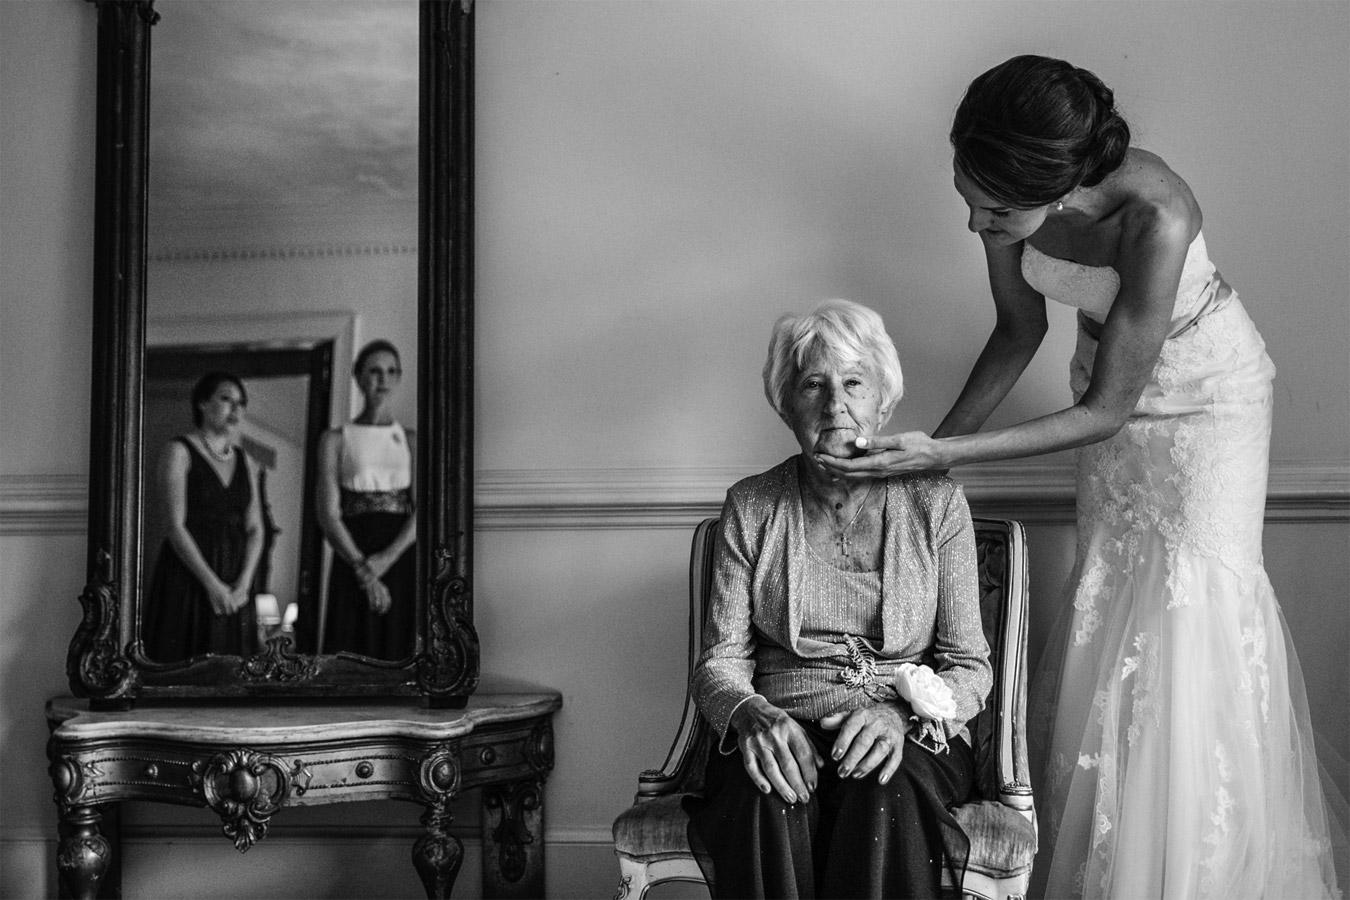 Кэти Меркле / Katie Merkle, Главная премия в категории «Фотожурналистика», Фотоконкурс WPPI Annual Print Competition